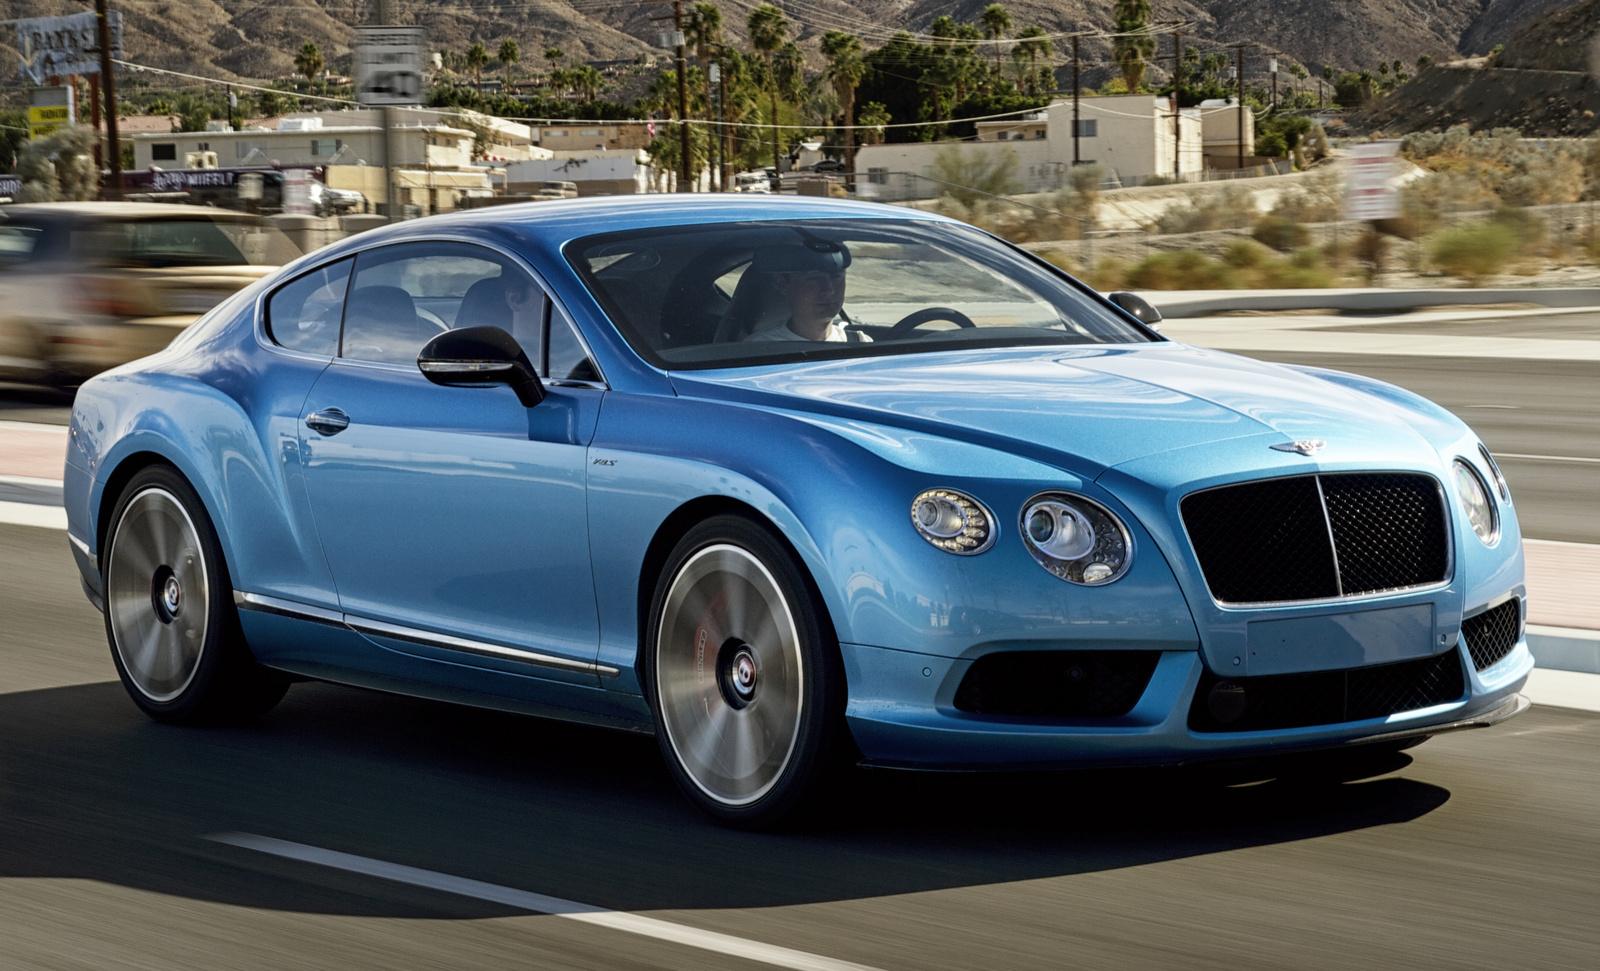 2015 Bentley Continental Gt Review Cargurus